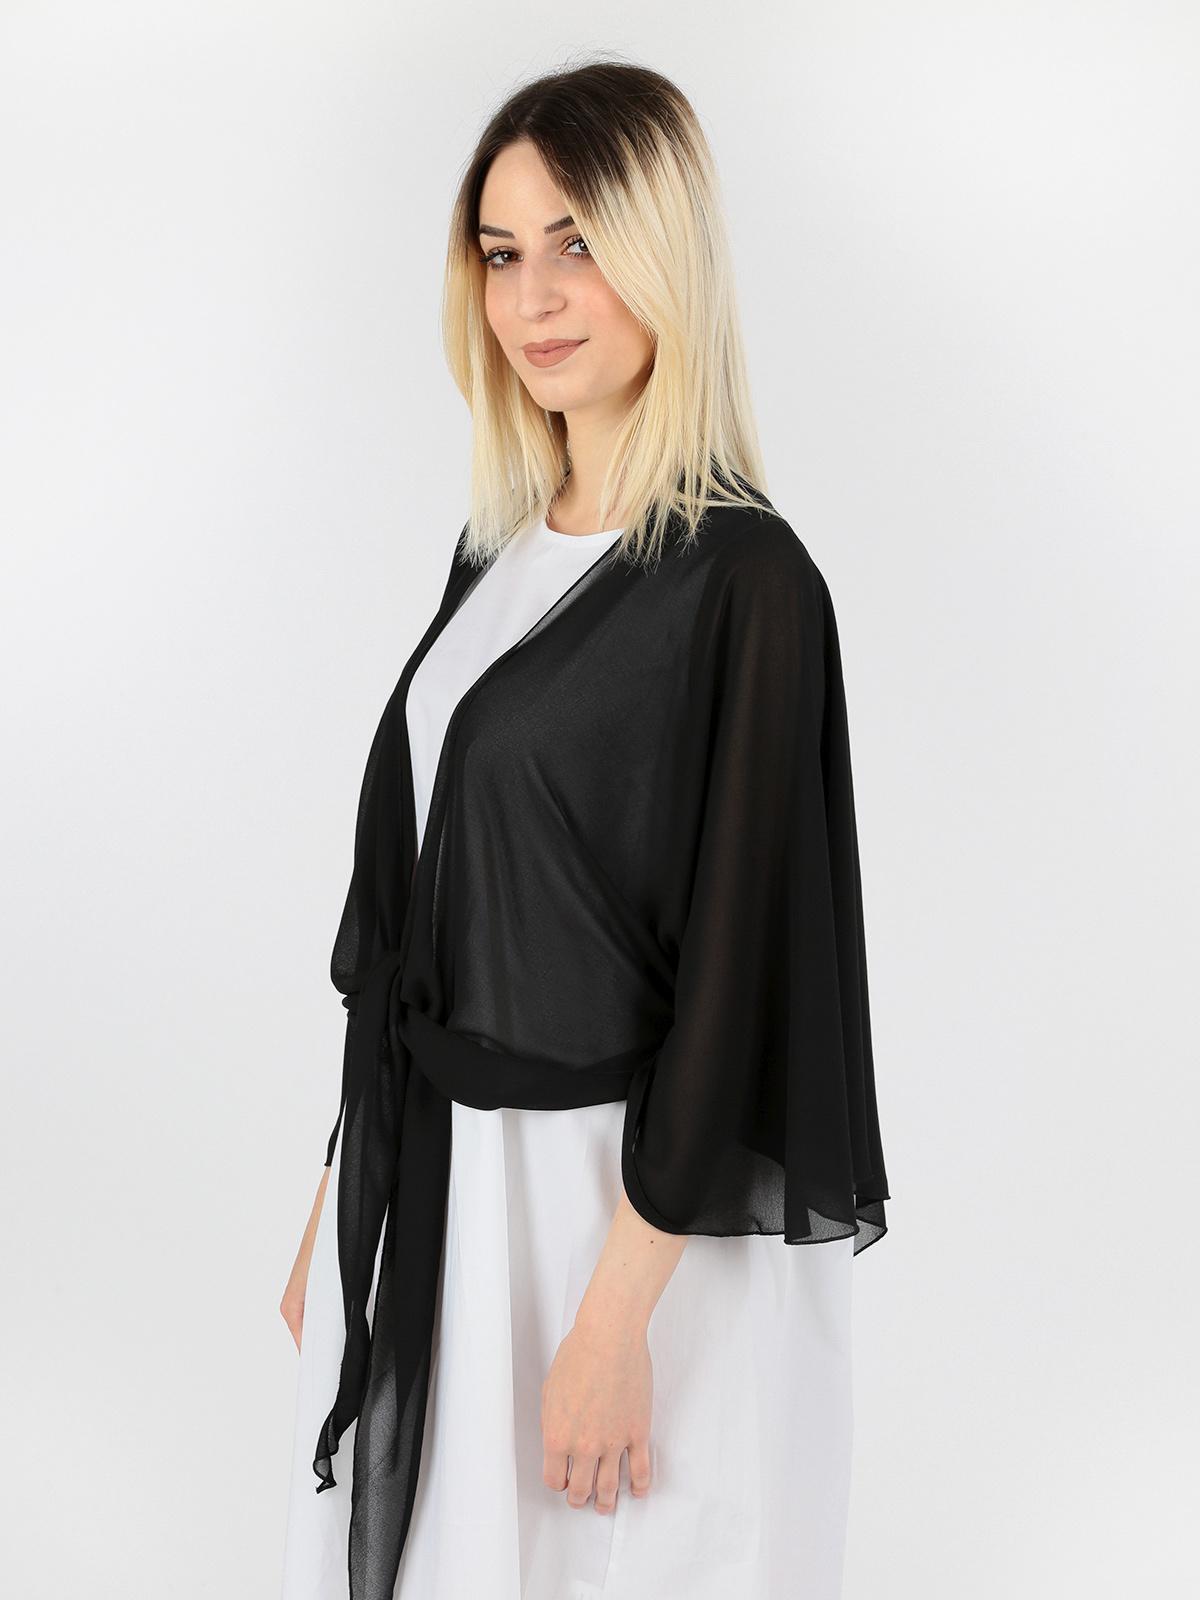 sale retailer 87973 0cdbb Con Nodo Elegante SoladaMecshopping Coprispalle Nero trhsQCd